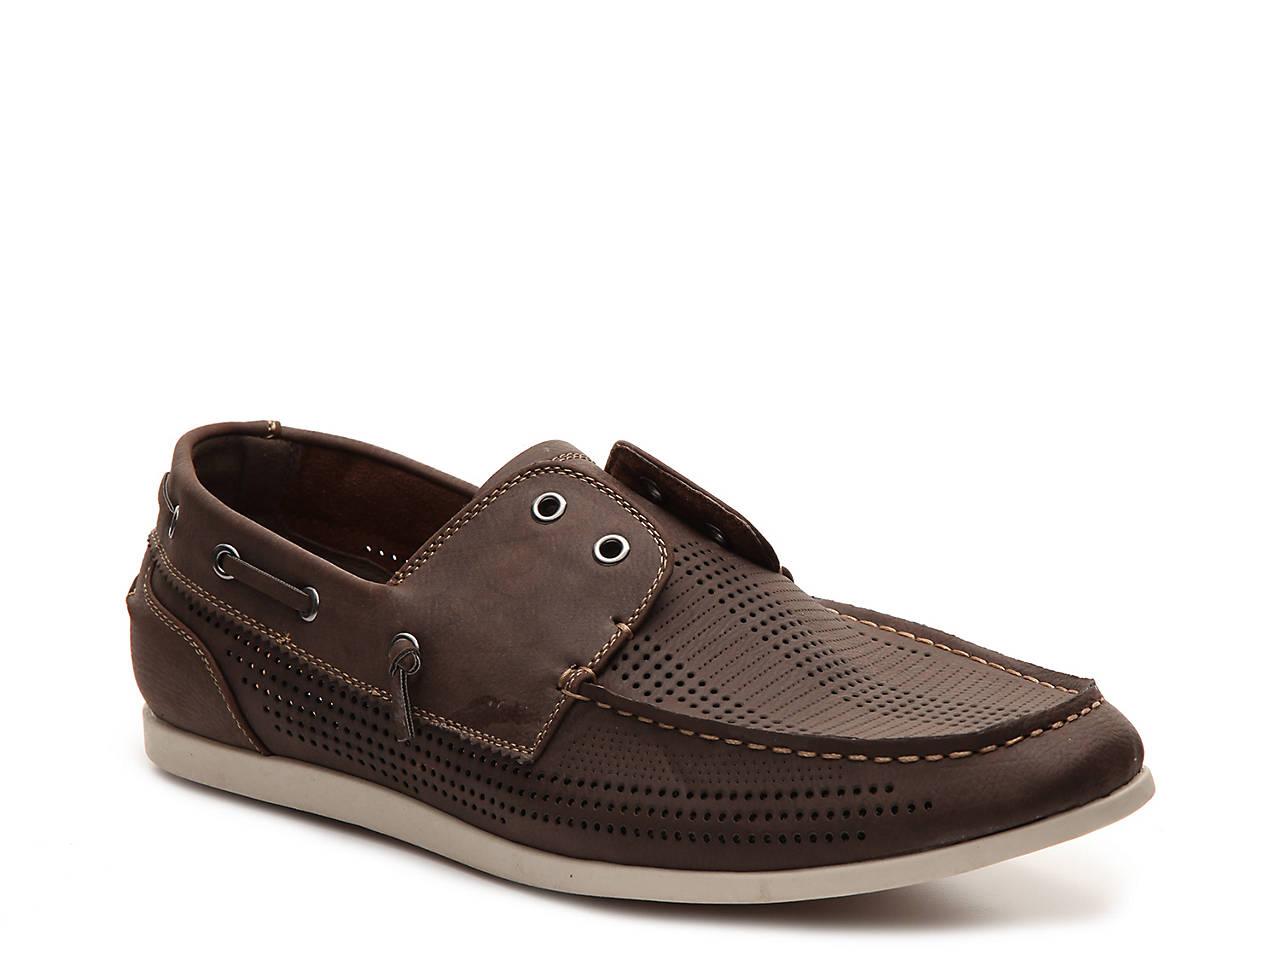 Guppi Boat Shoe